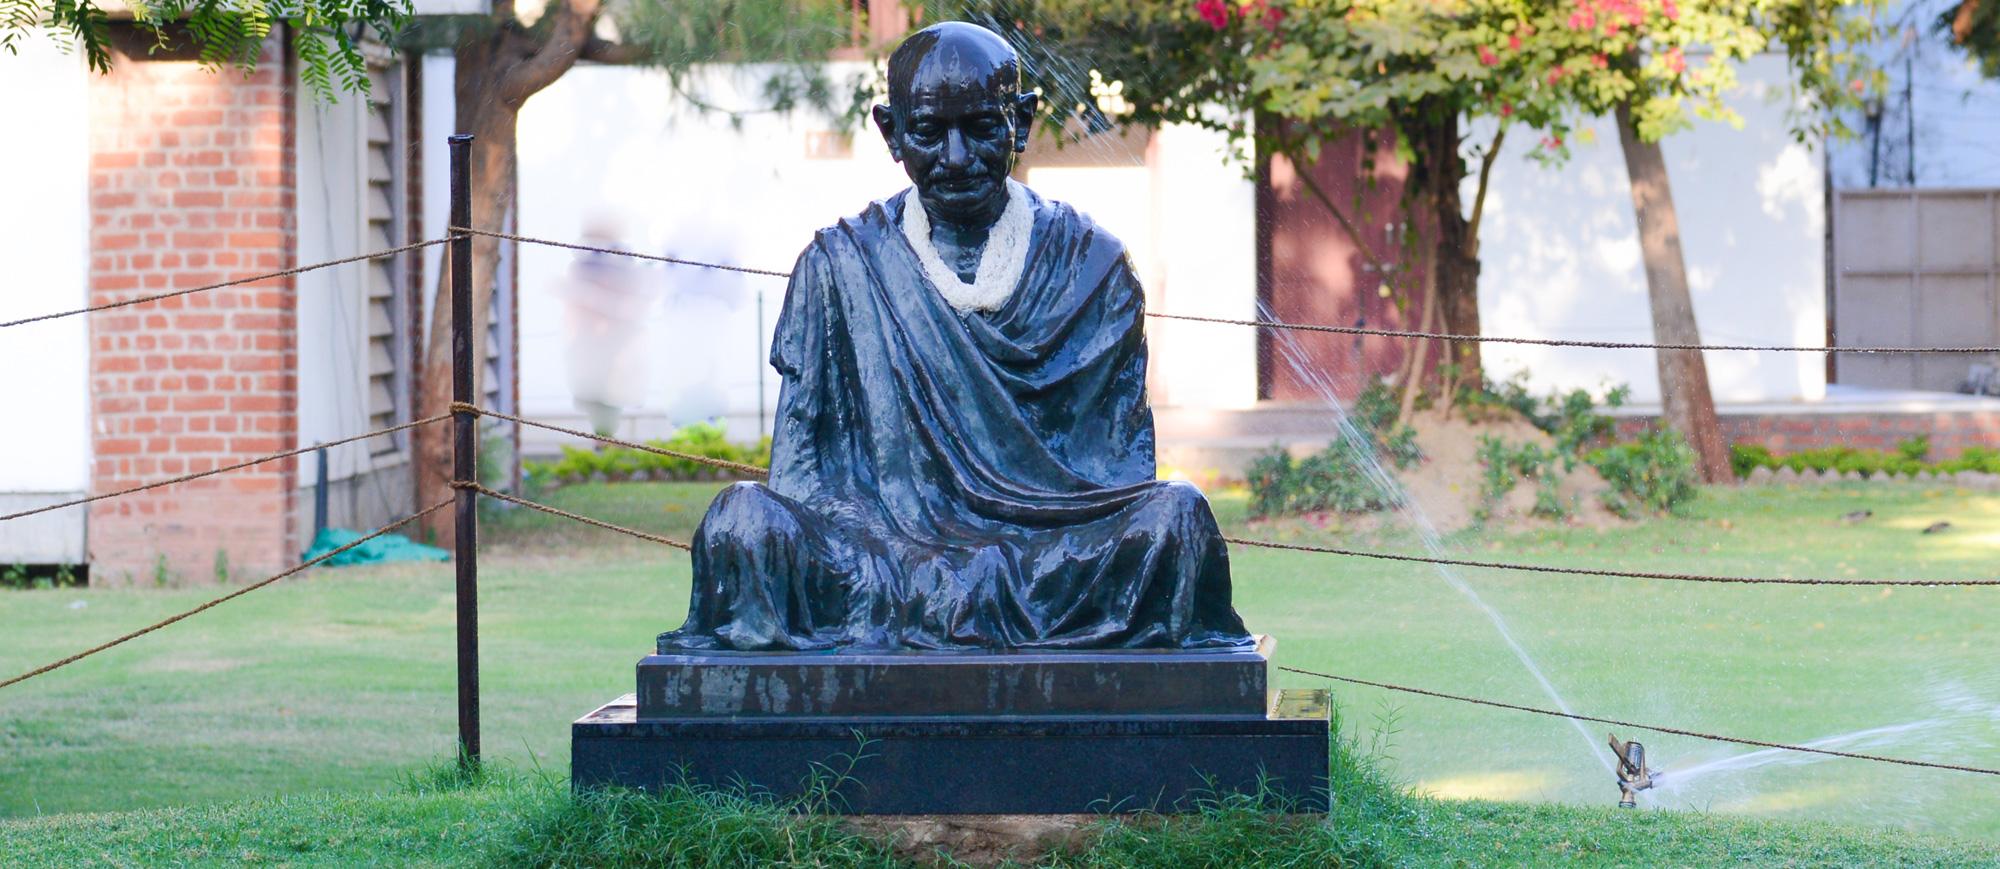 A statue of Mahatma Gandhi on display at Gandhi Ashram